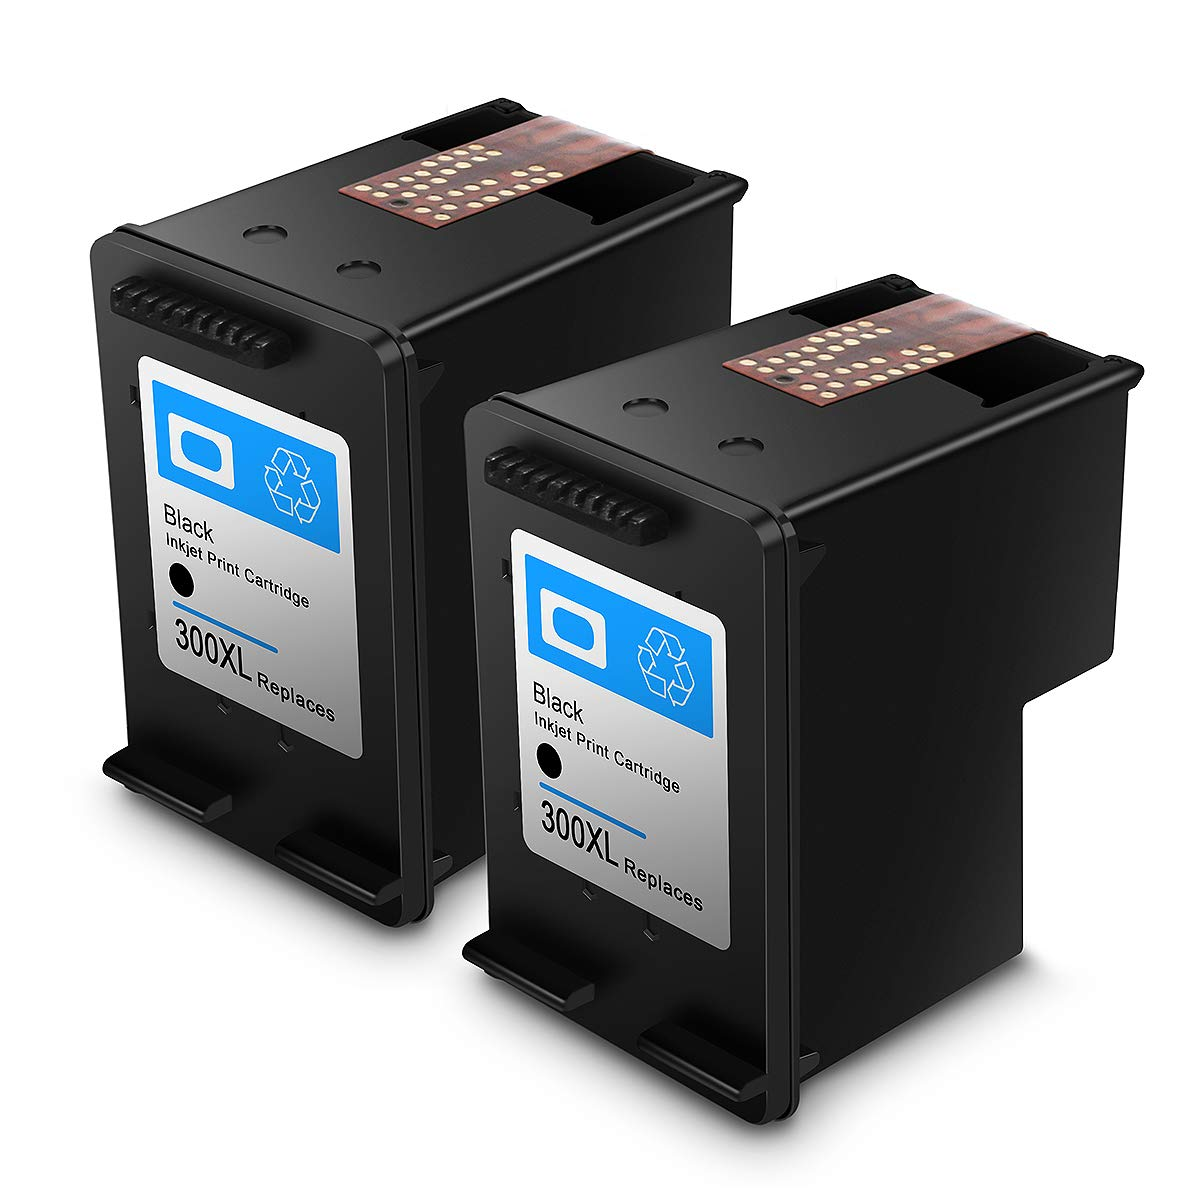 Reconstruido HP 300 XL HP 300 Cartuchos de Tinta de Alto Rendimiento Compatible con HP DeskJet D1660/D2660/D5560/F2480/F4280/F4580 (2 Negro)